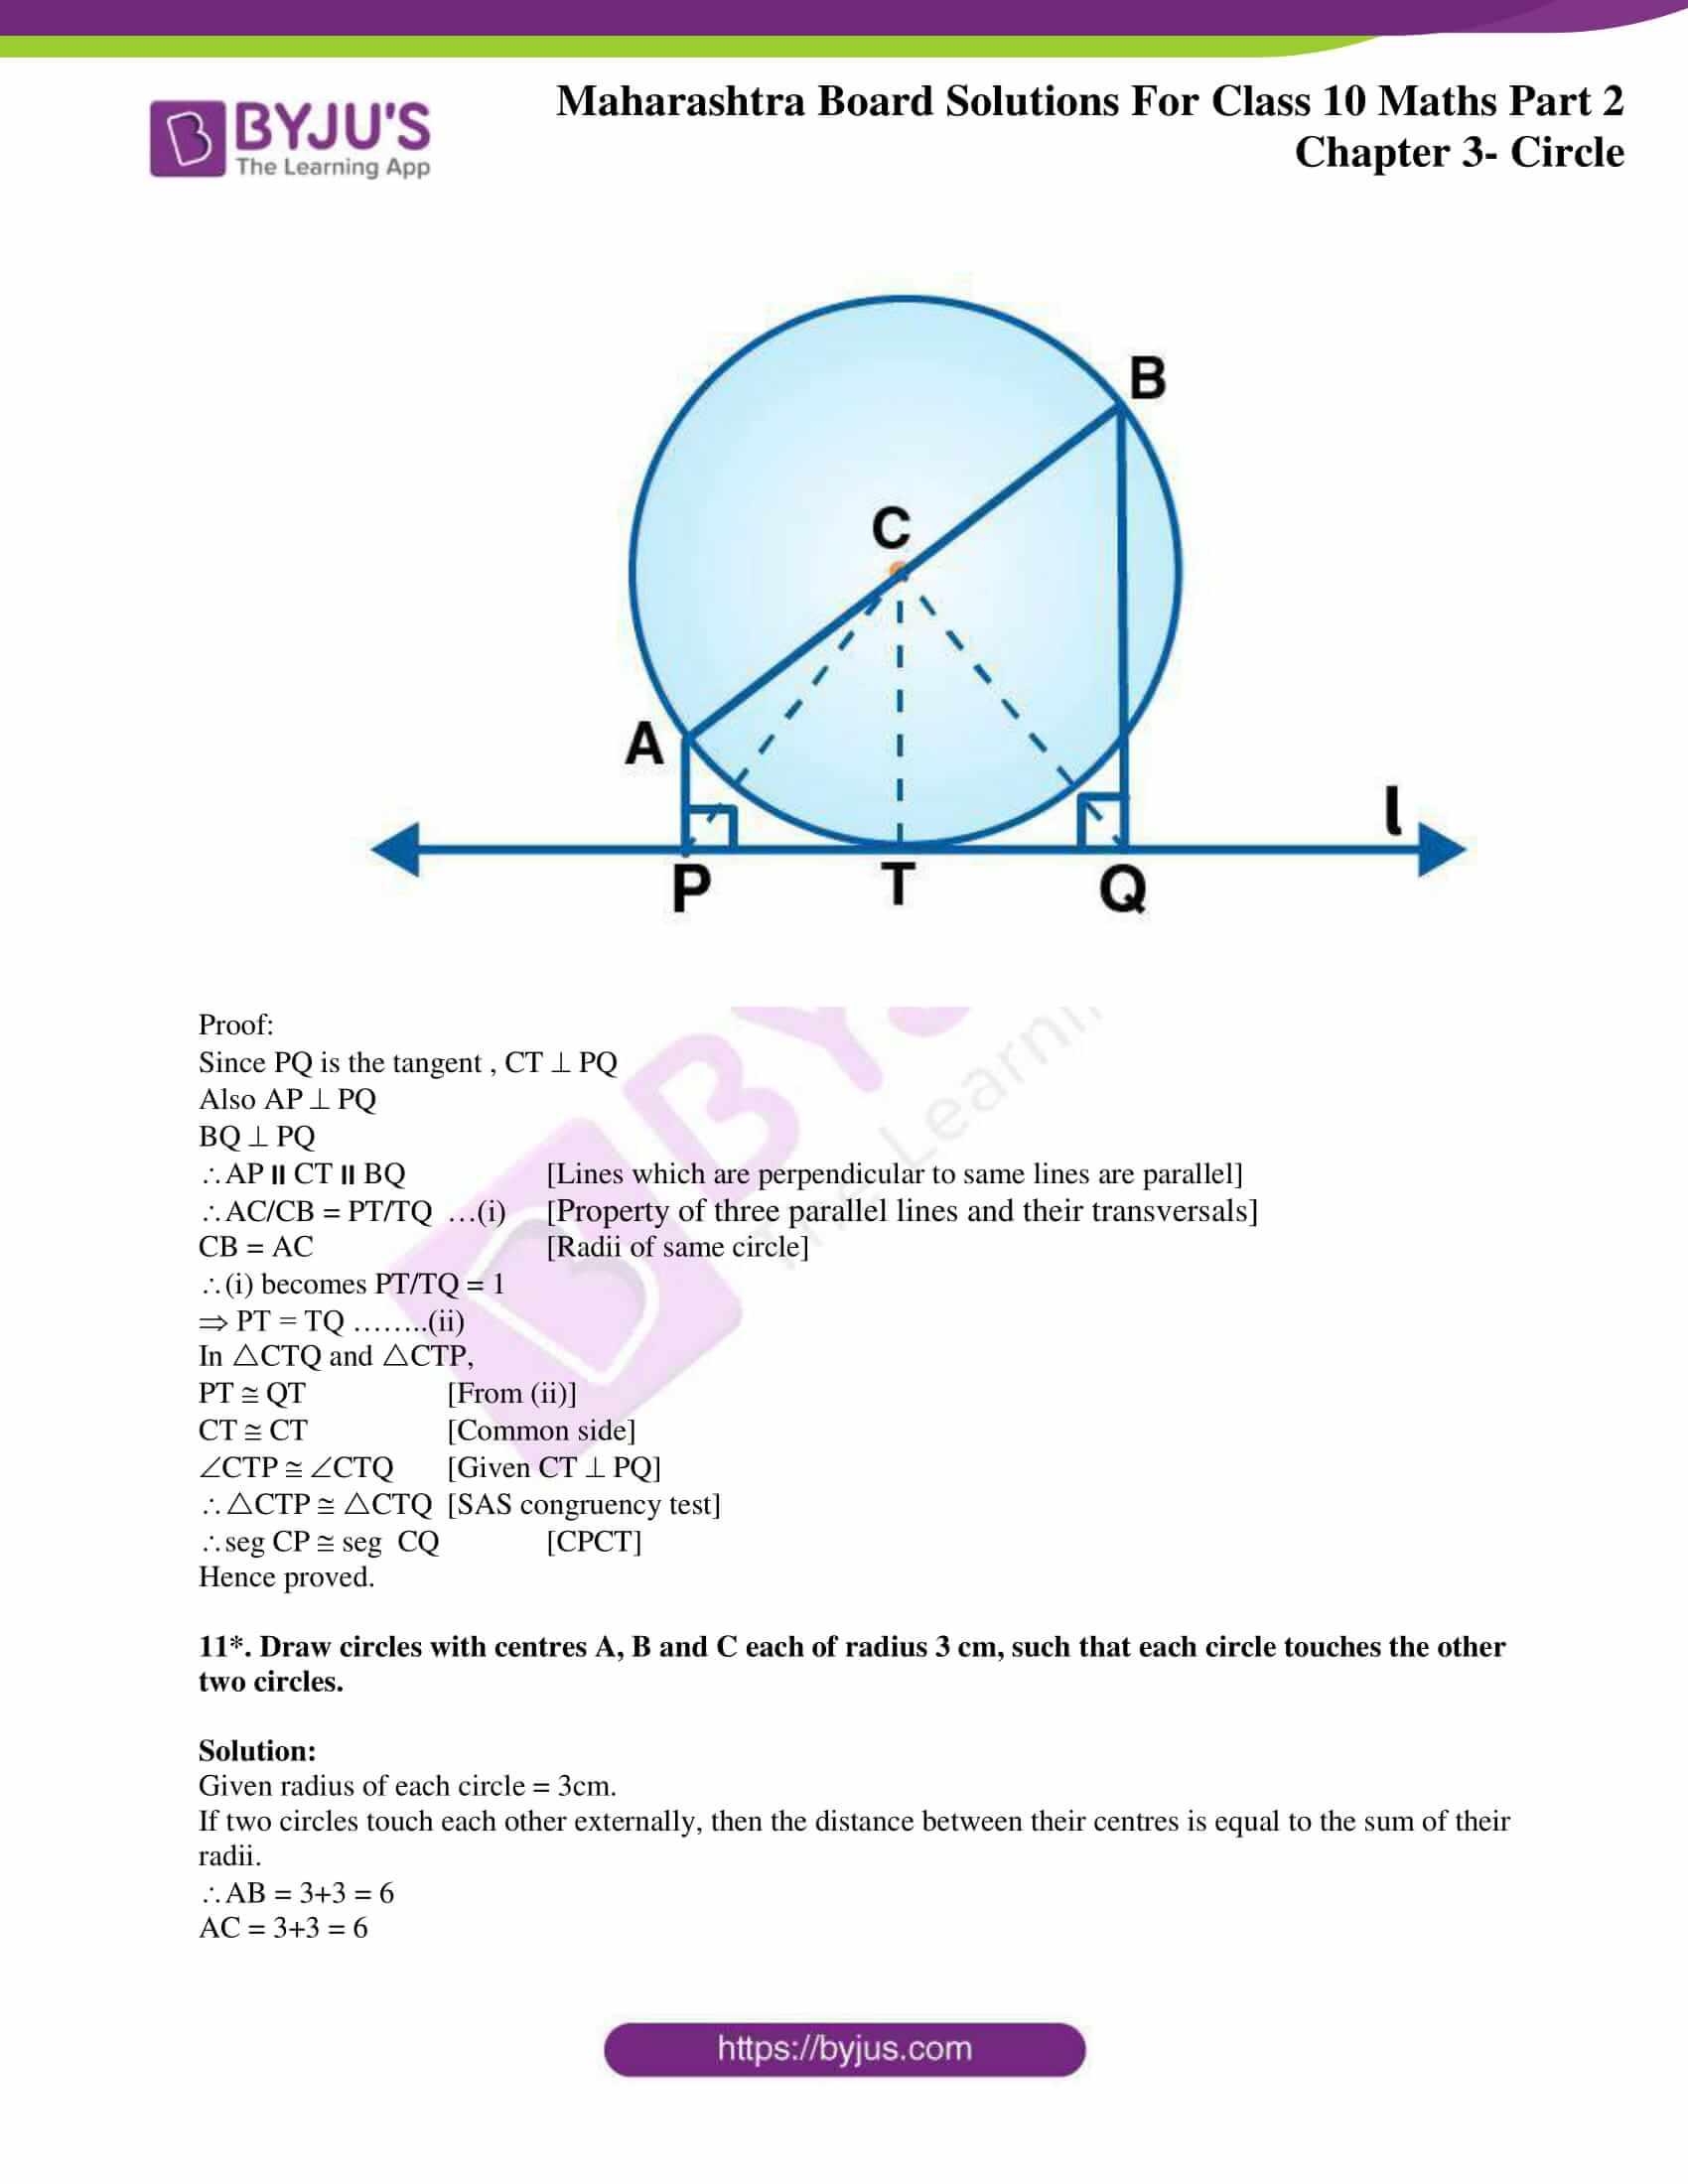 msbshse sol class 10 maths part 2 chapter 3 30